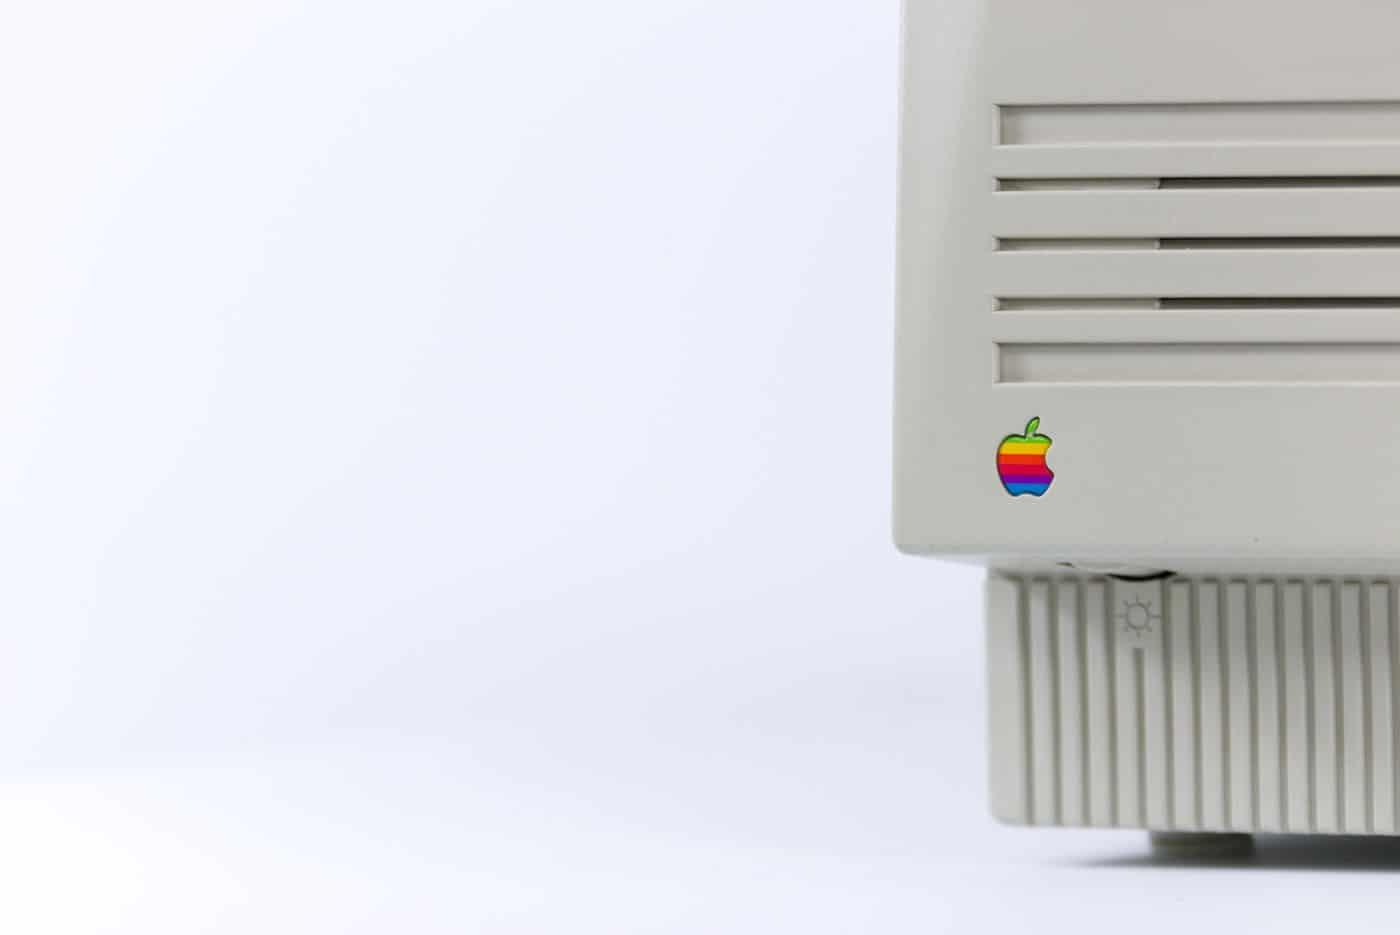 An old Apple Macintosh.